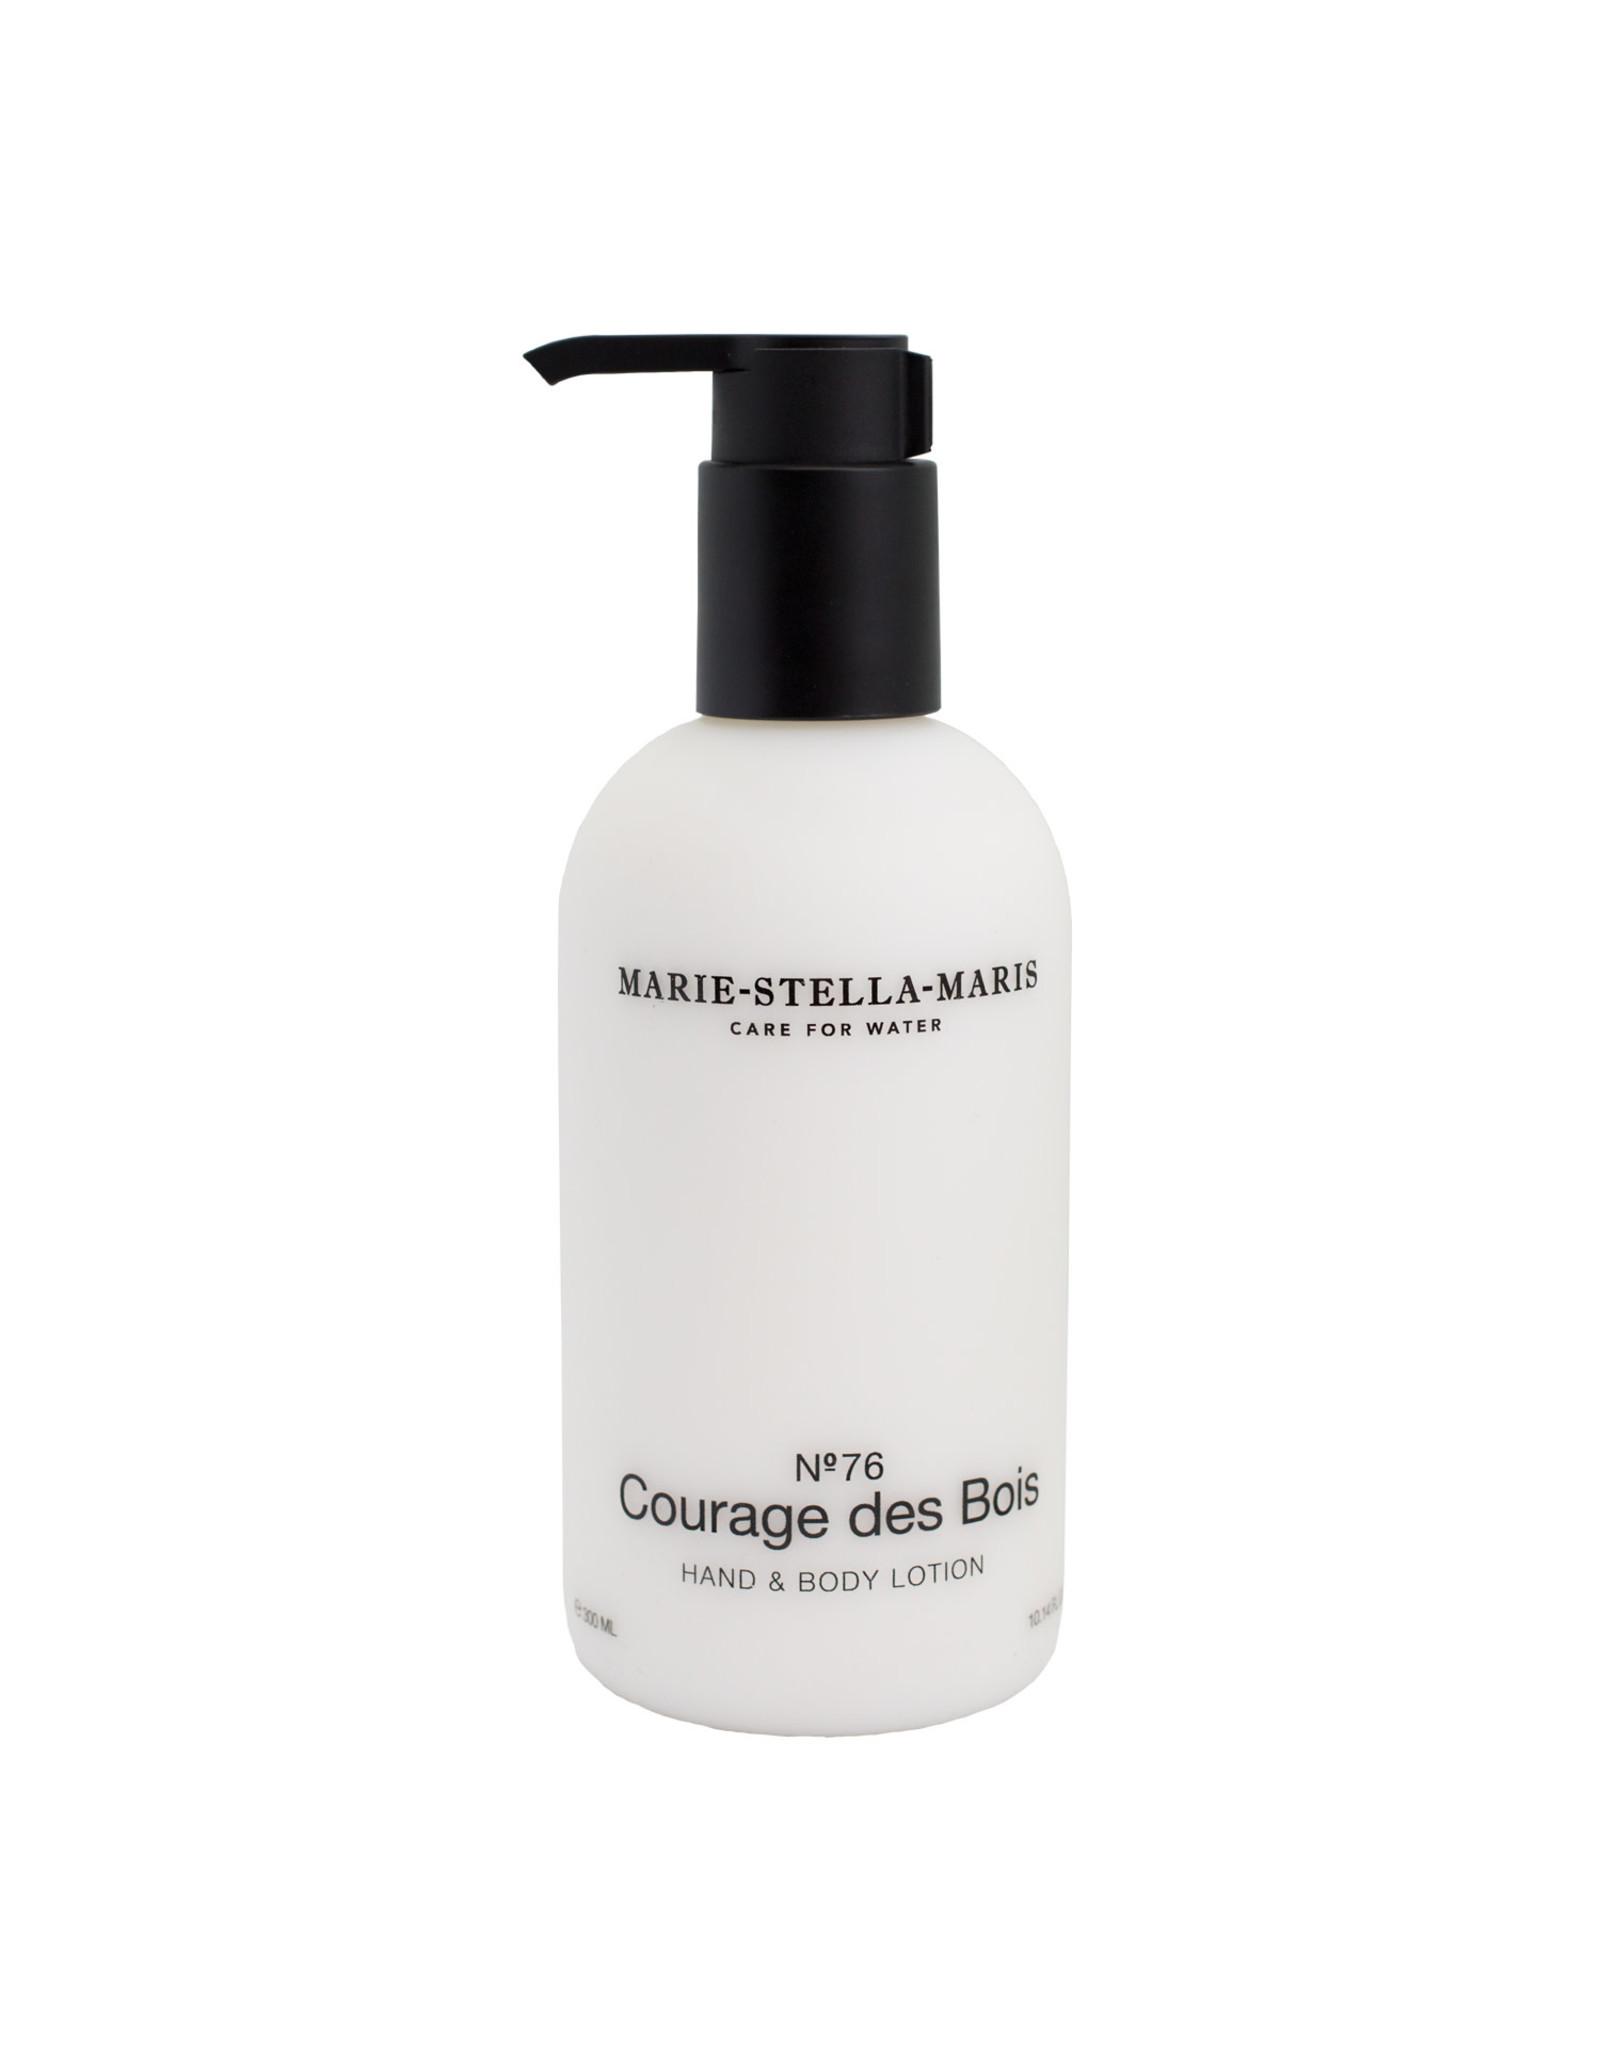 Marie-Stella-Maris Hand & Body Lotion Courage des Bois